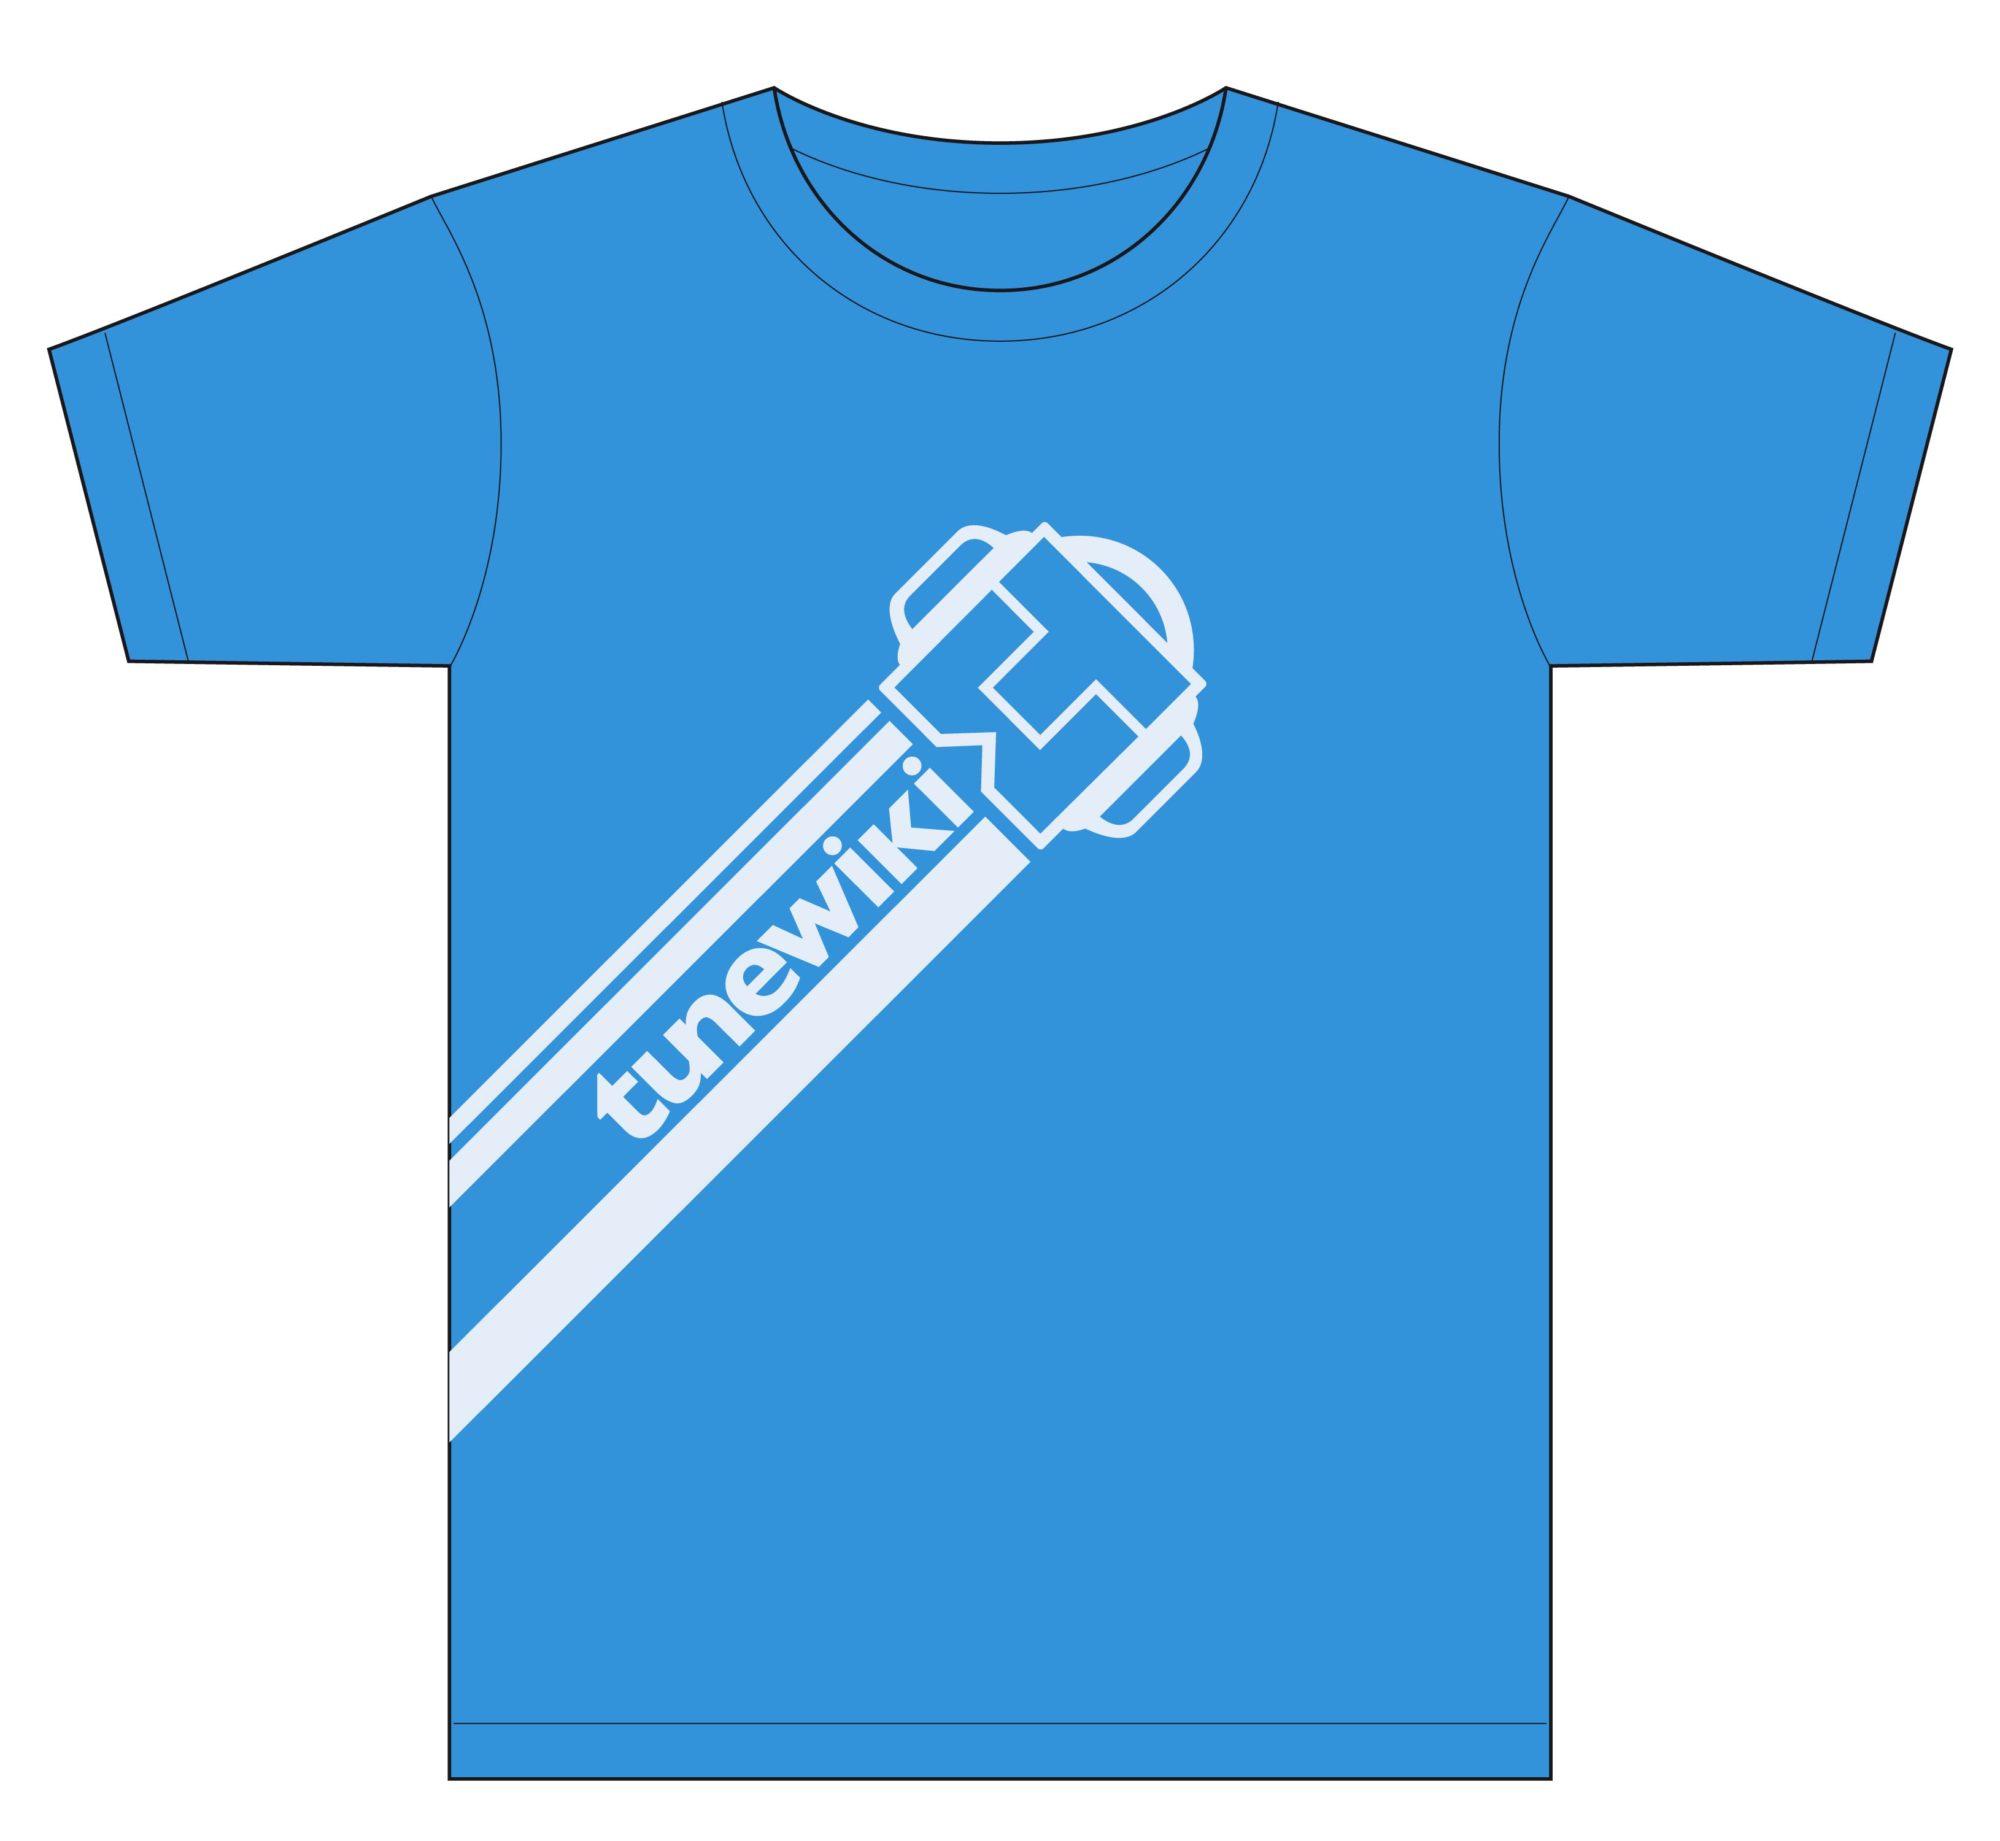 Tunewiki Tshirt Design